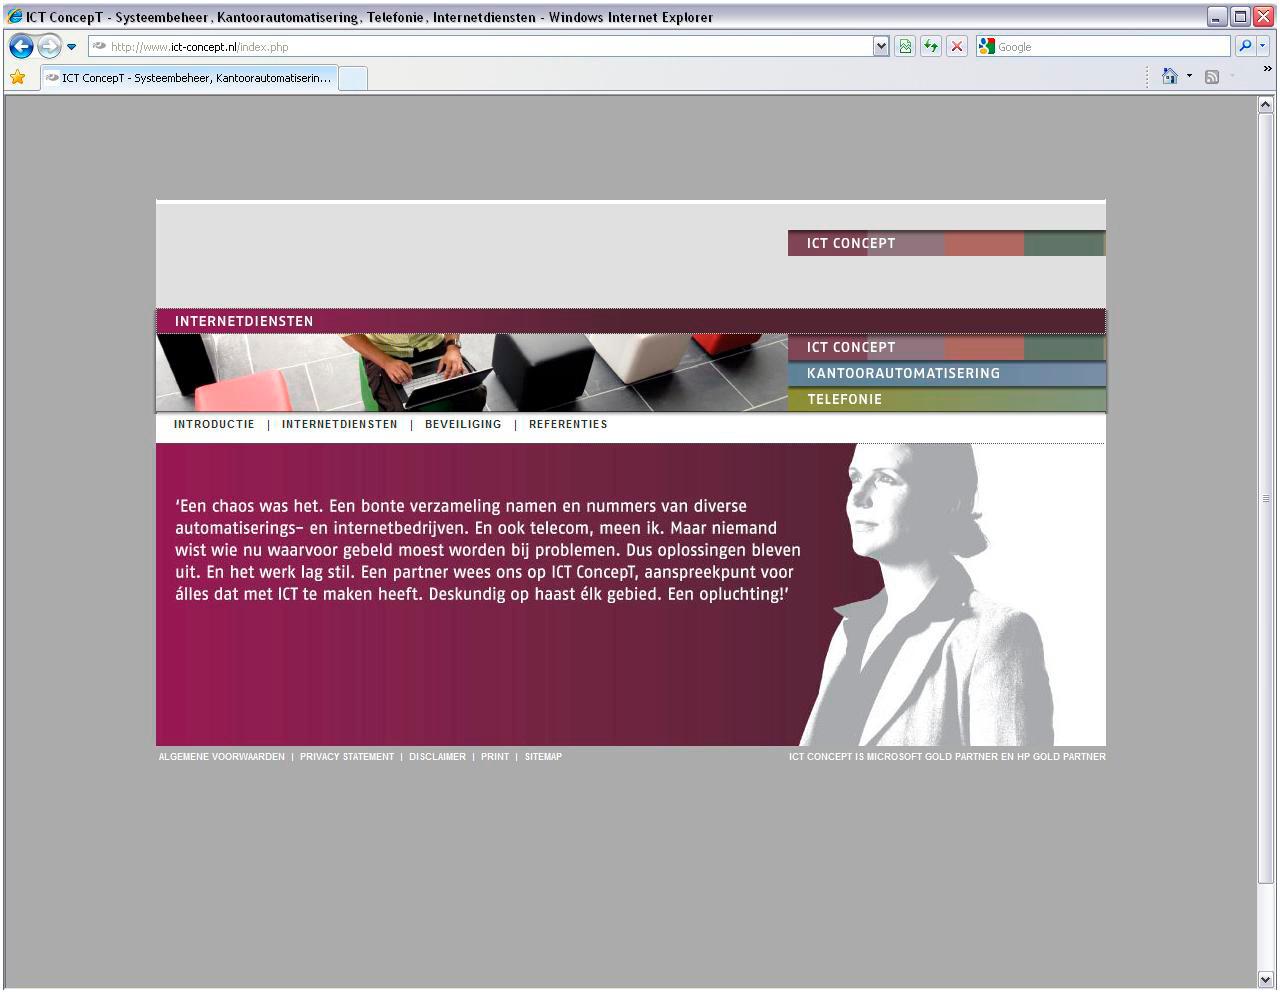 www.ict-concept.nl